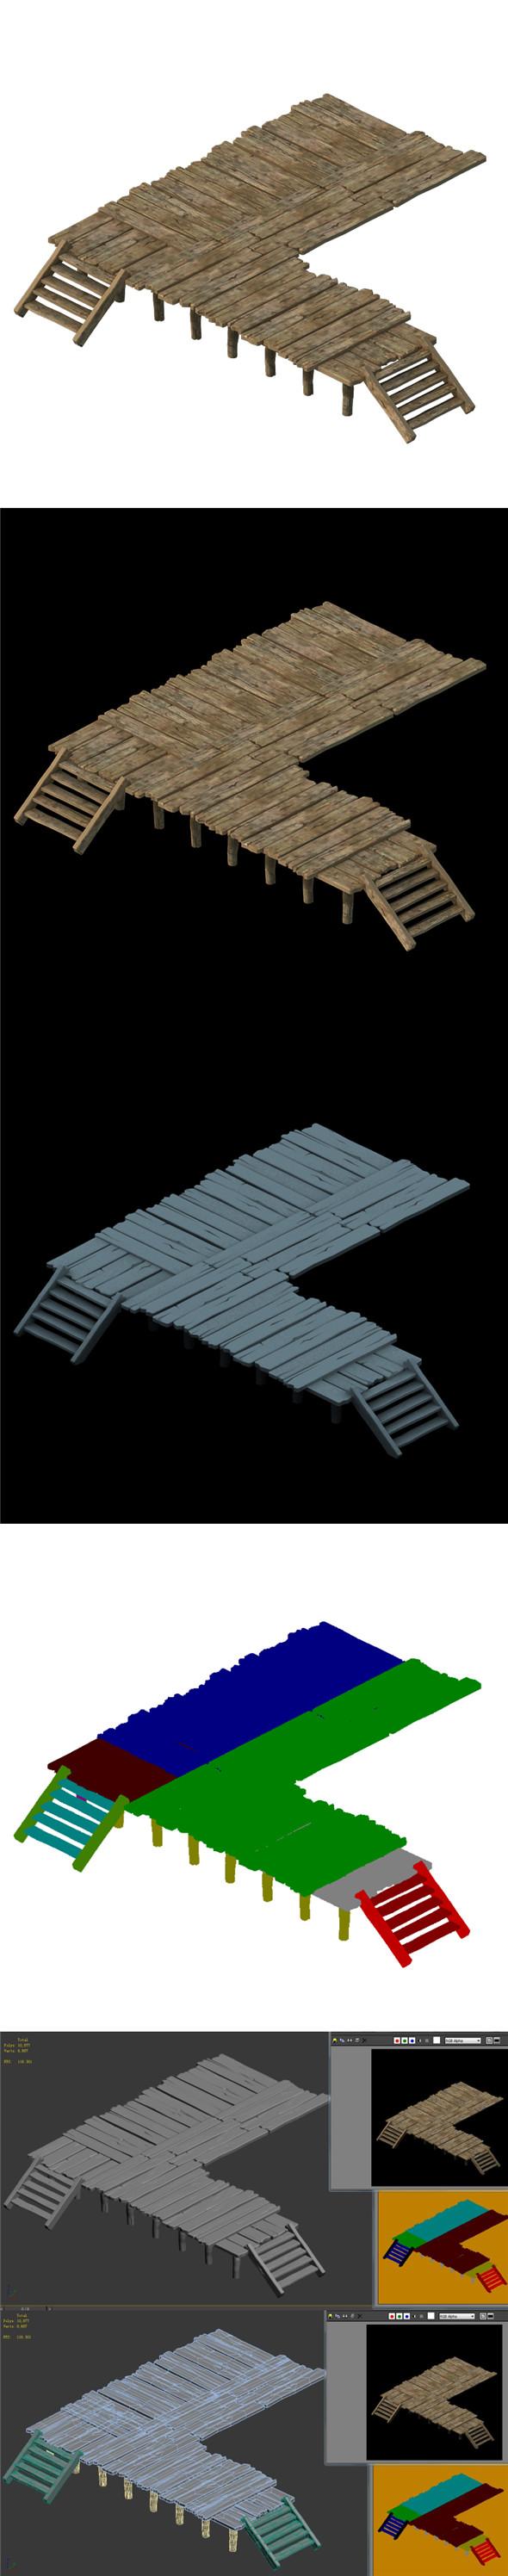 Wooden board - corridor stairs 03 - 3DOcean Item for Sale